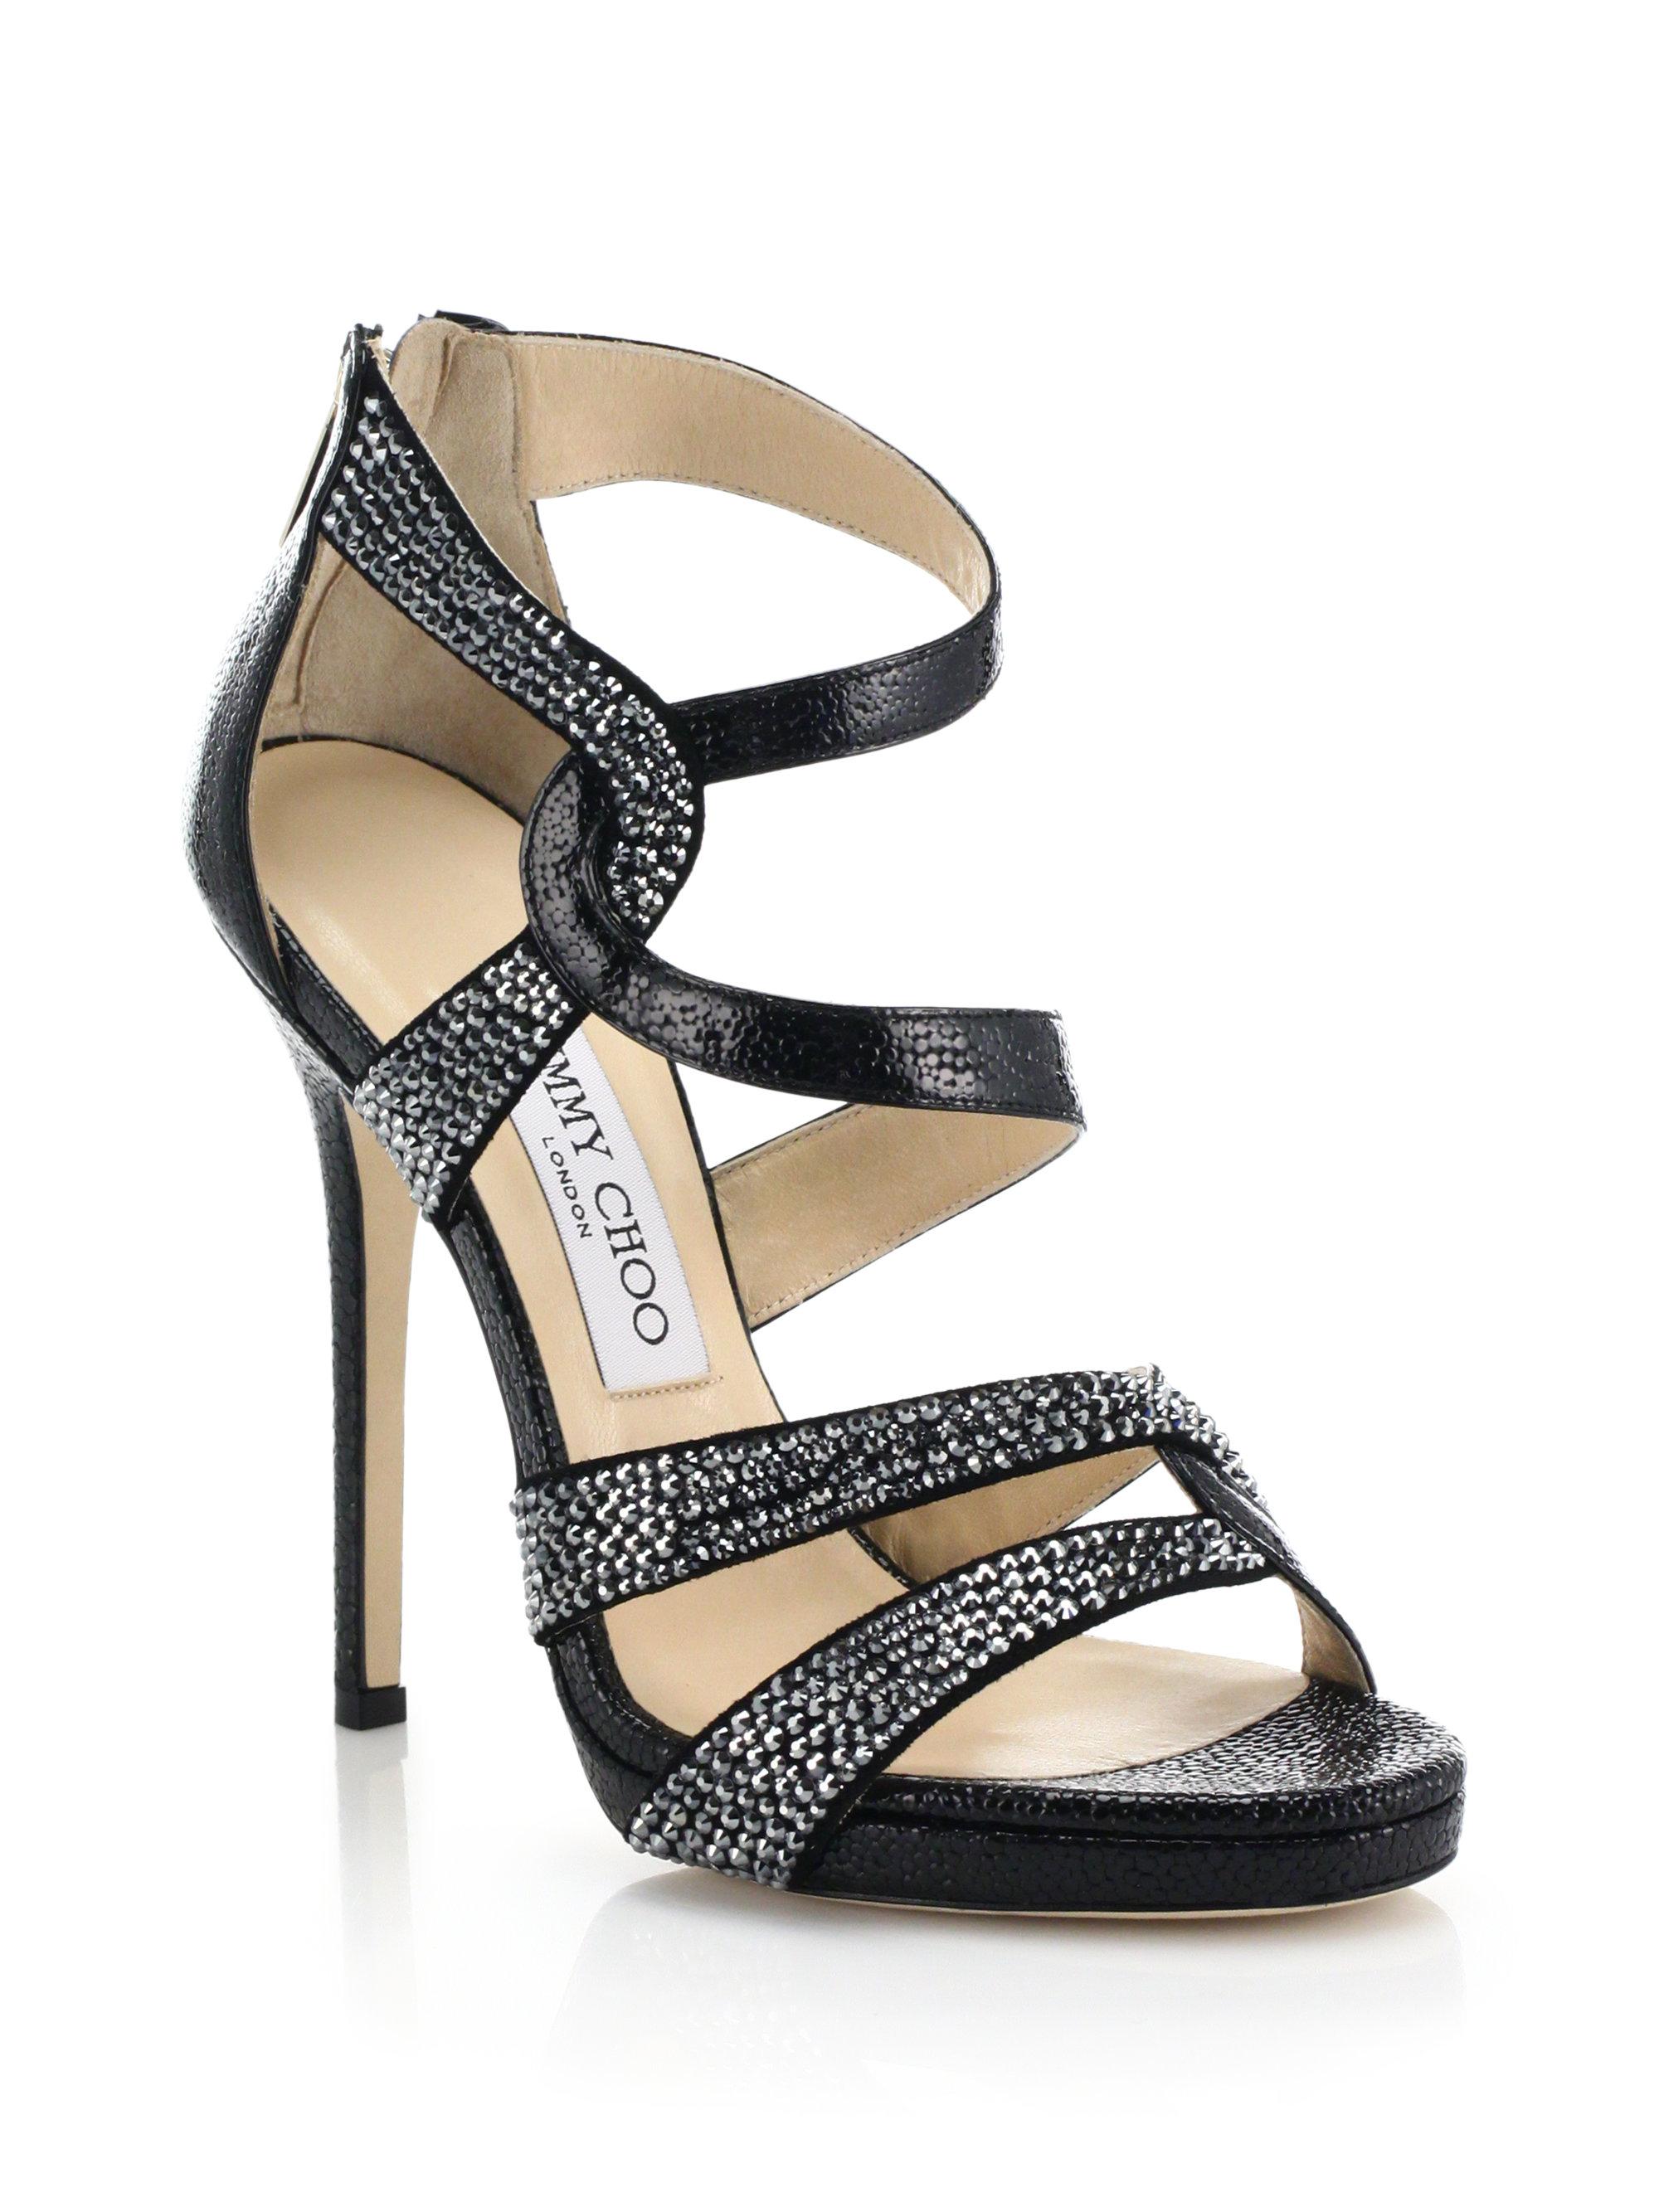 5ad5f9090106d8 Lyst - Jimmy Choo Swarovski Crystal Pebbled Leather Sandals in Black